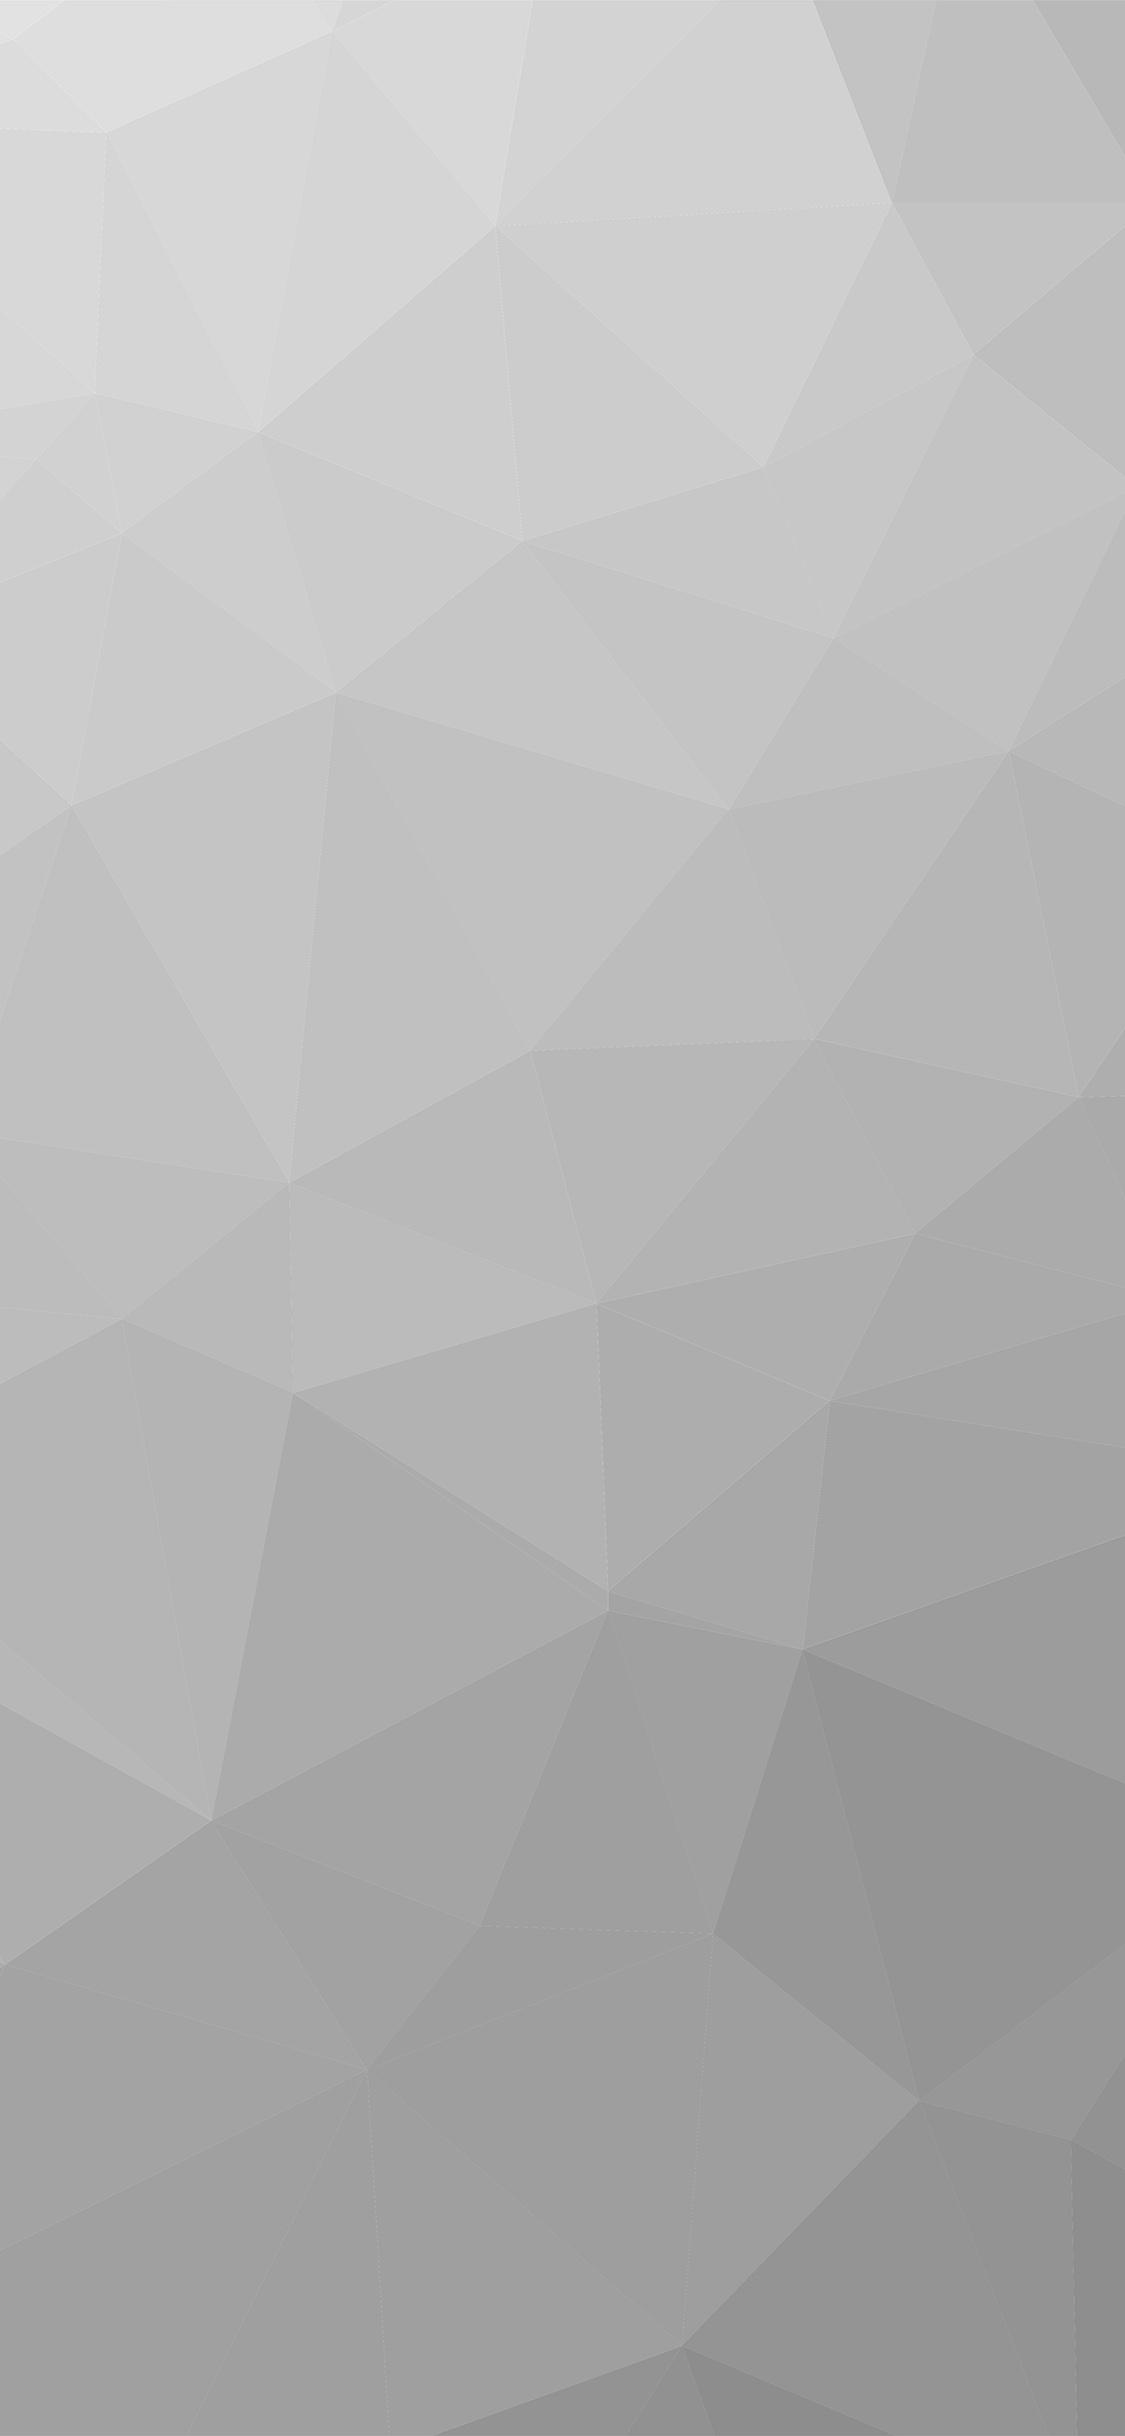 Vk67 Samsung Galaxy Polyart Pastel White Pattern Wallpaper